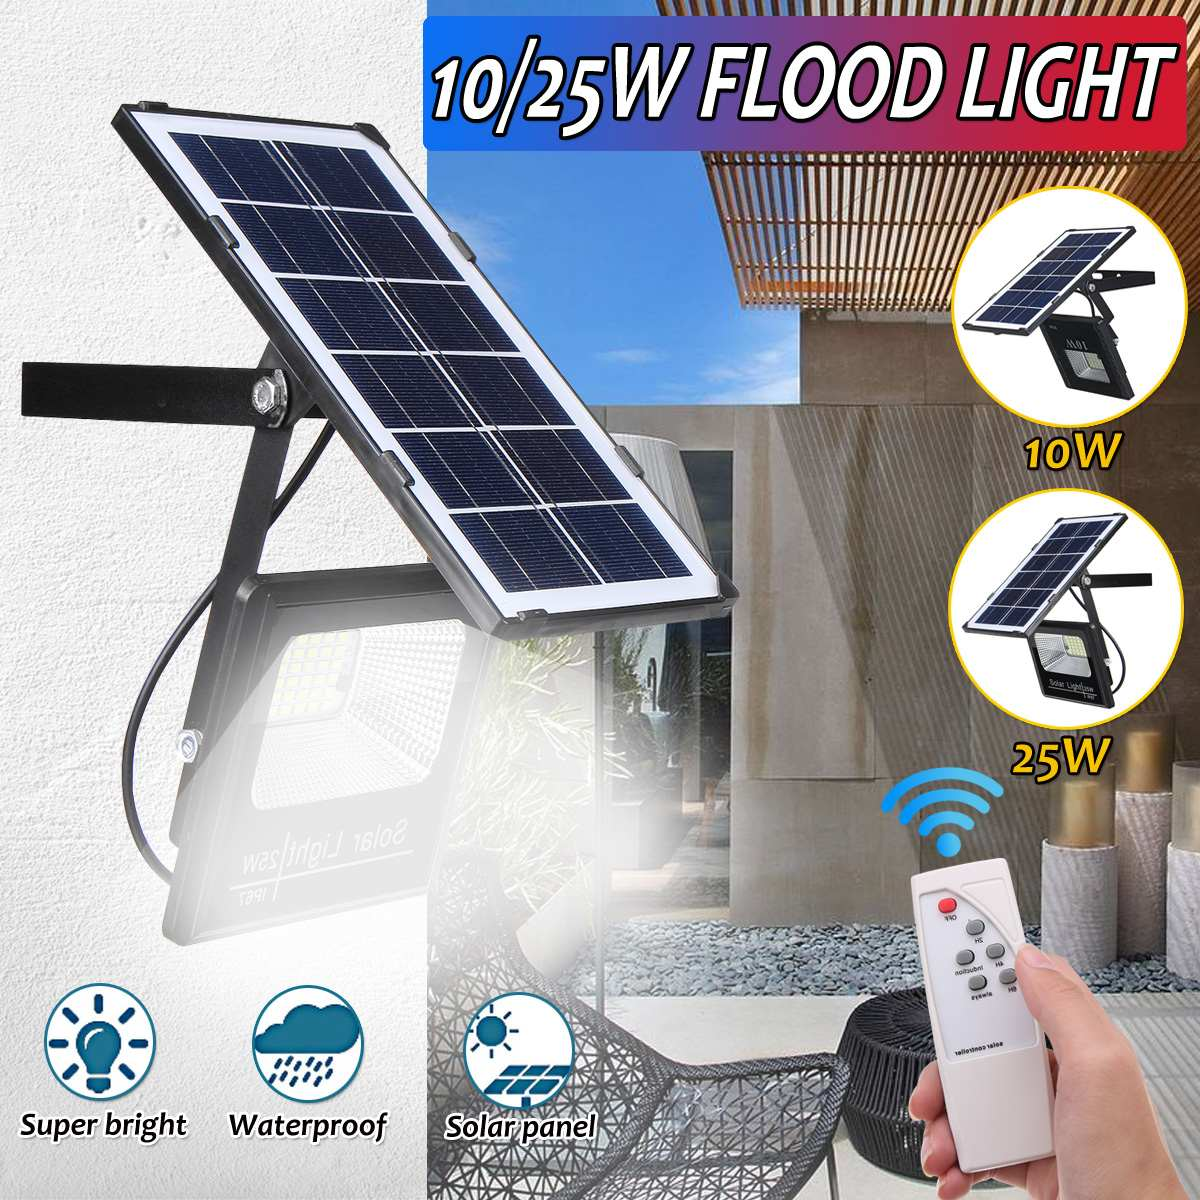 Solar Floodlight Led Portable Spotlight Floodlight 10/25W Outdoor Street  Garden Light Waterproof Wall Lamp With Remote Control